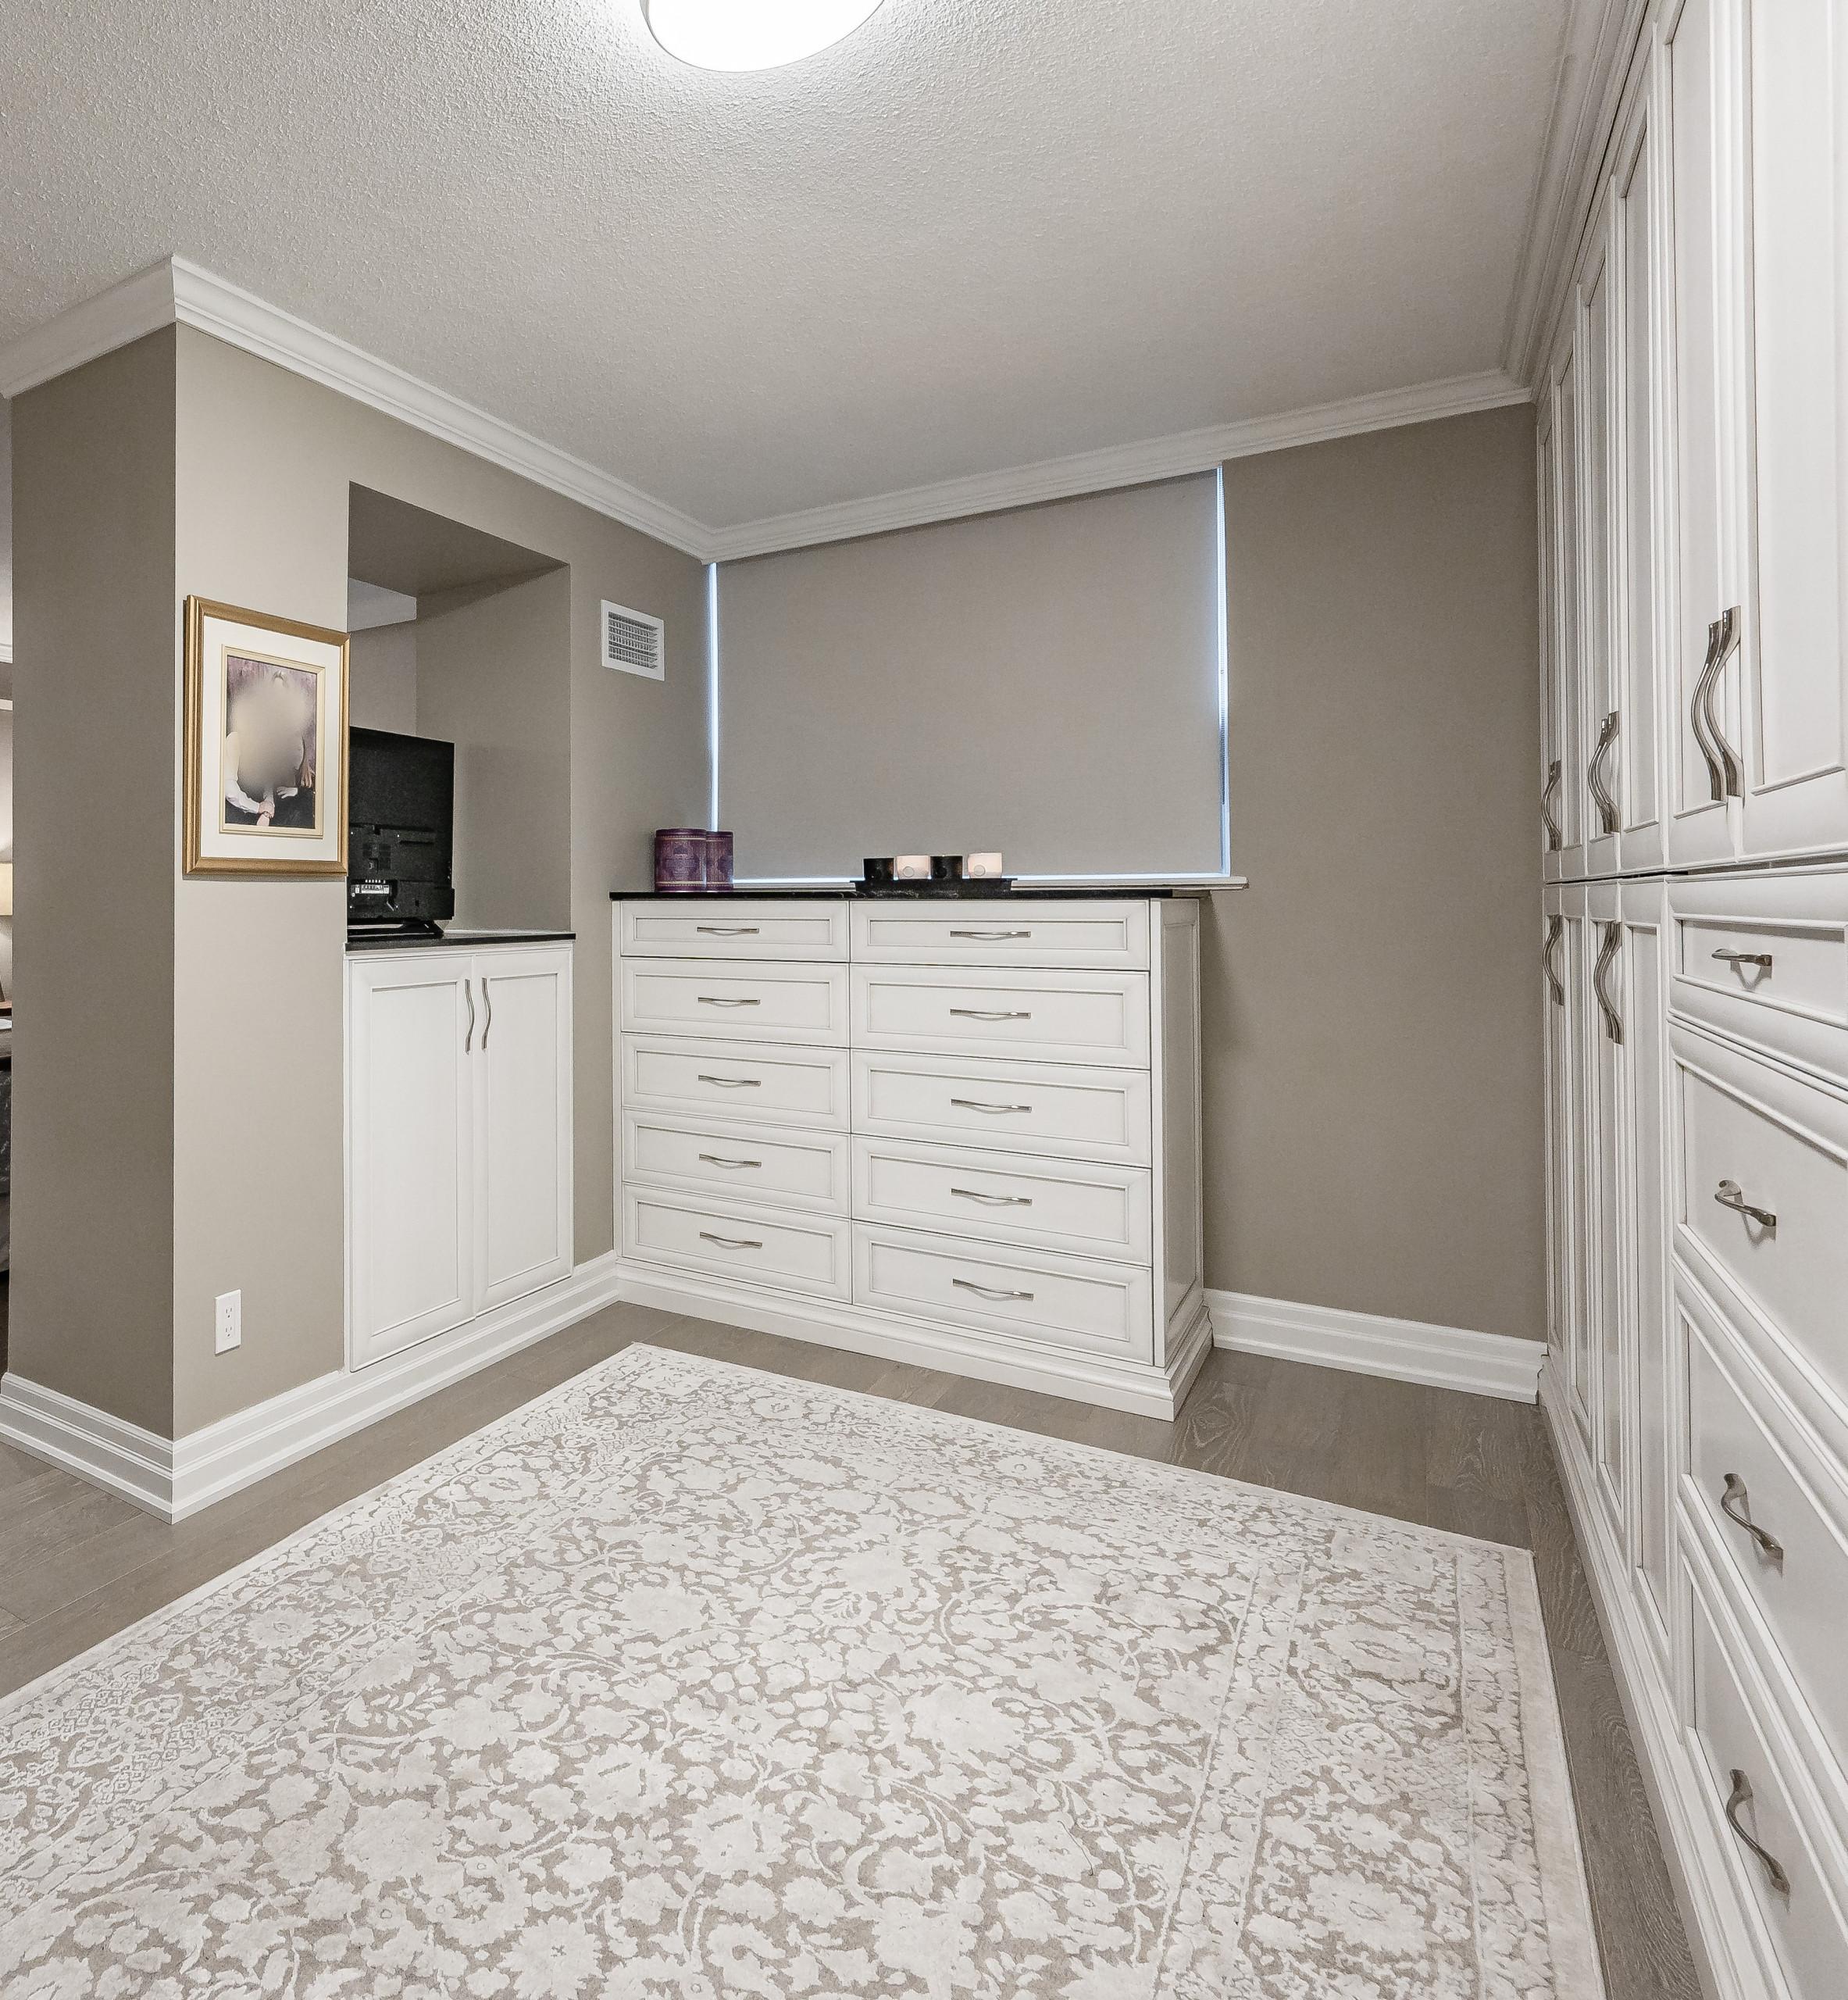 Condo renovation, kitchen, bathroom, living room, bedroom, laundry - Burlington